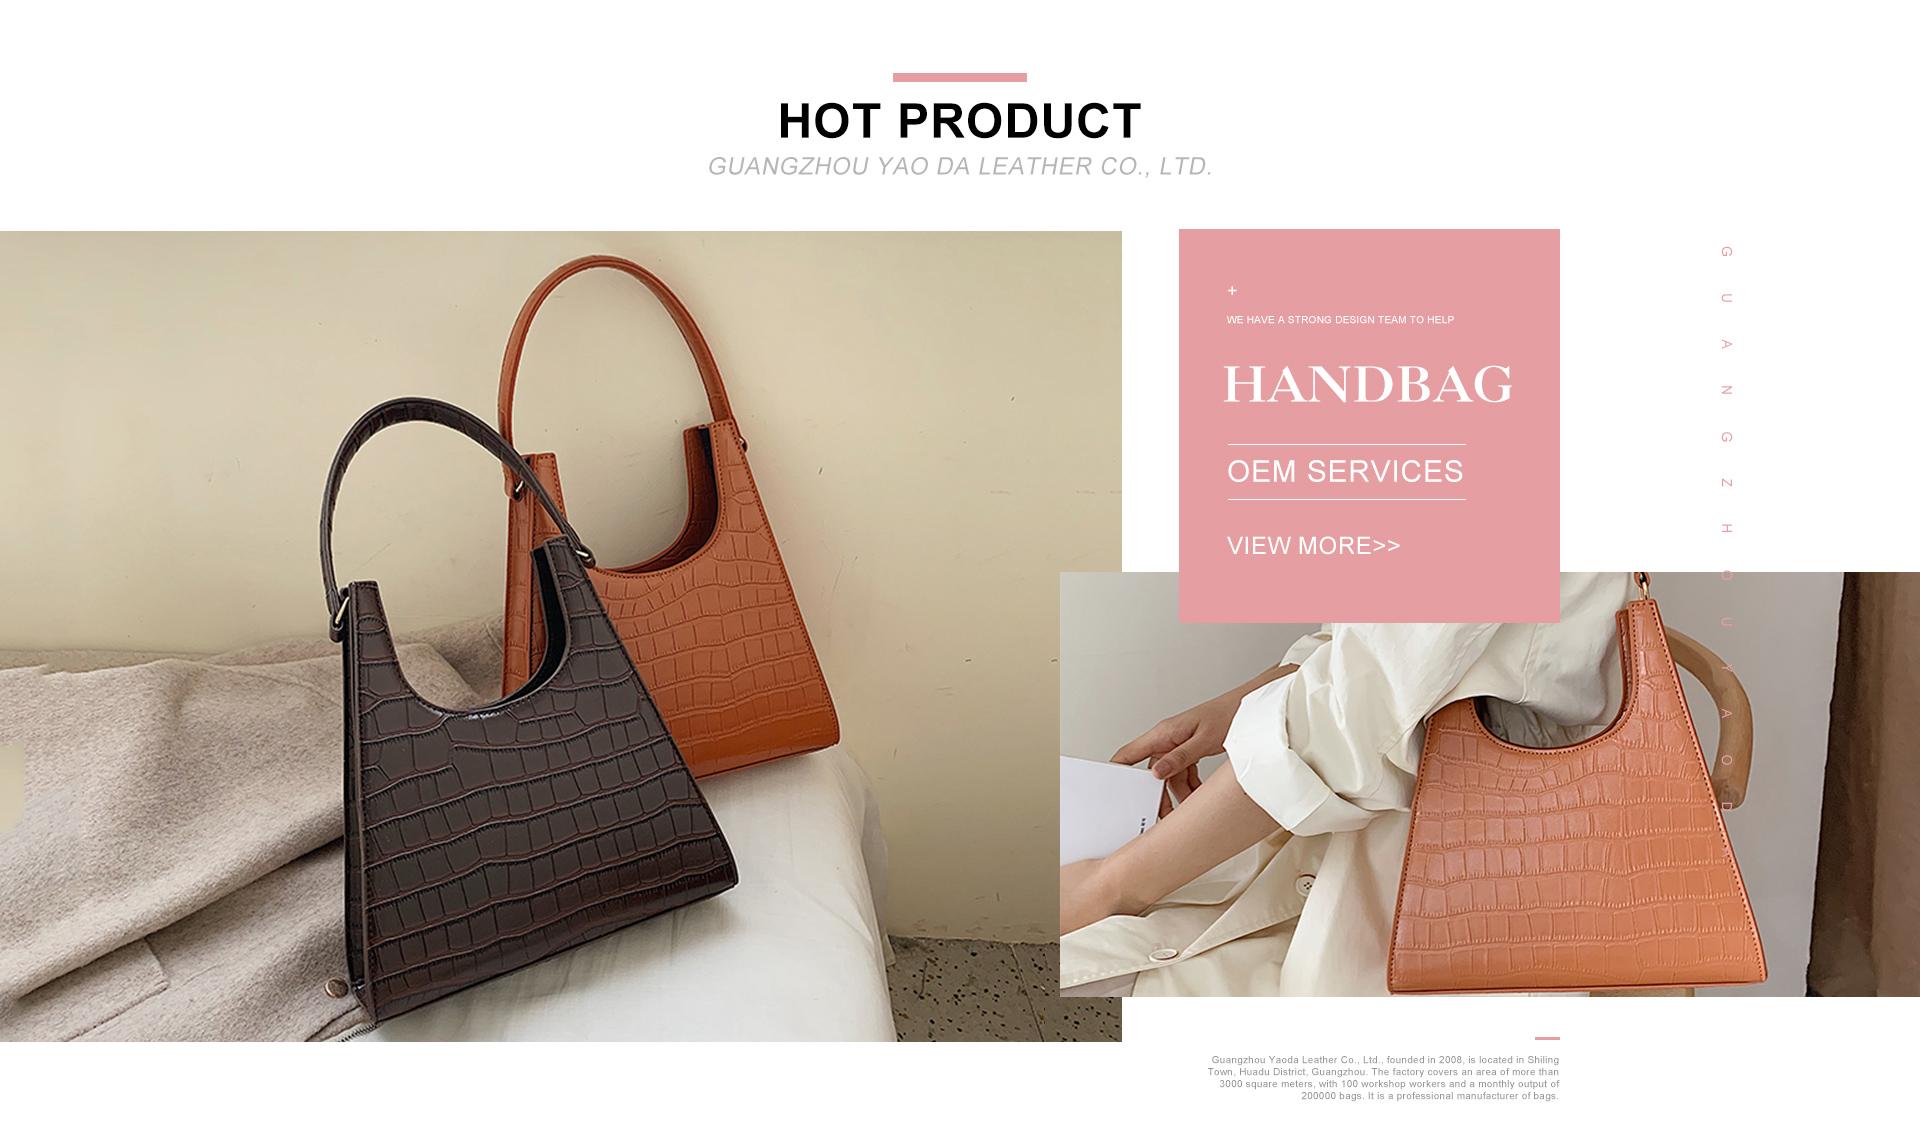 Zhao Liang Womens Leather Top-handle Tote Shoulder Messenger Bag Cross Body Purse Vintage Handbag Chic